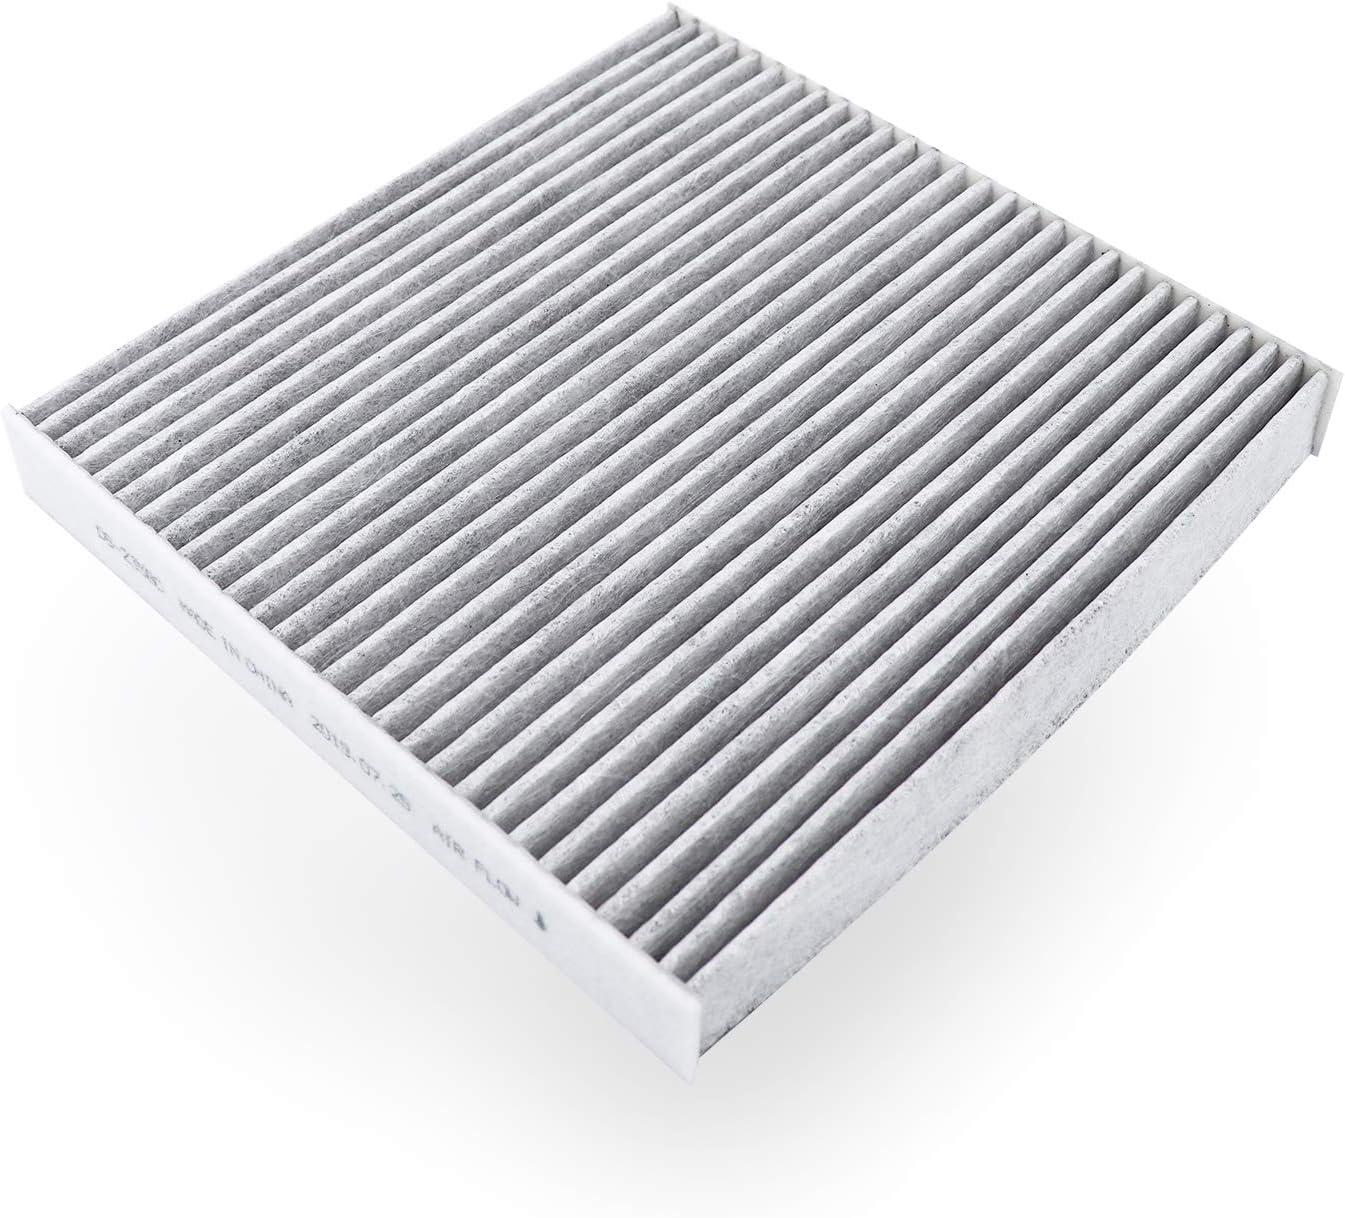 AmazonBasics Cabin Air Filter - 23 x 22.4 x 2.9 cm